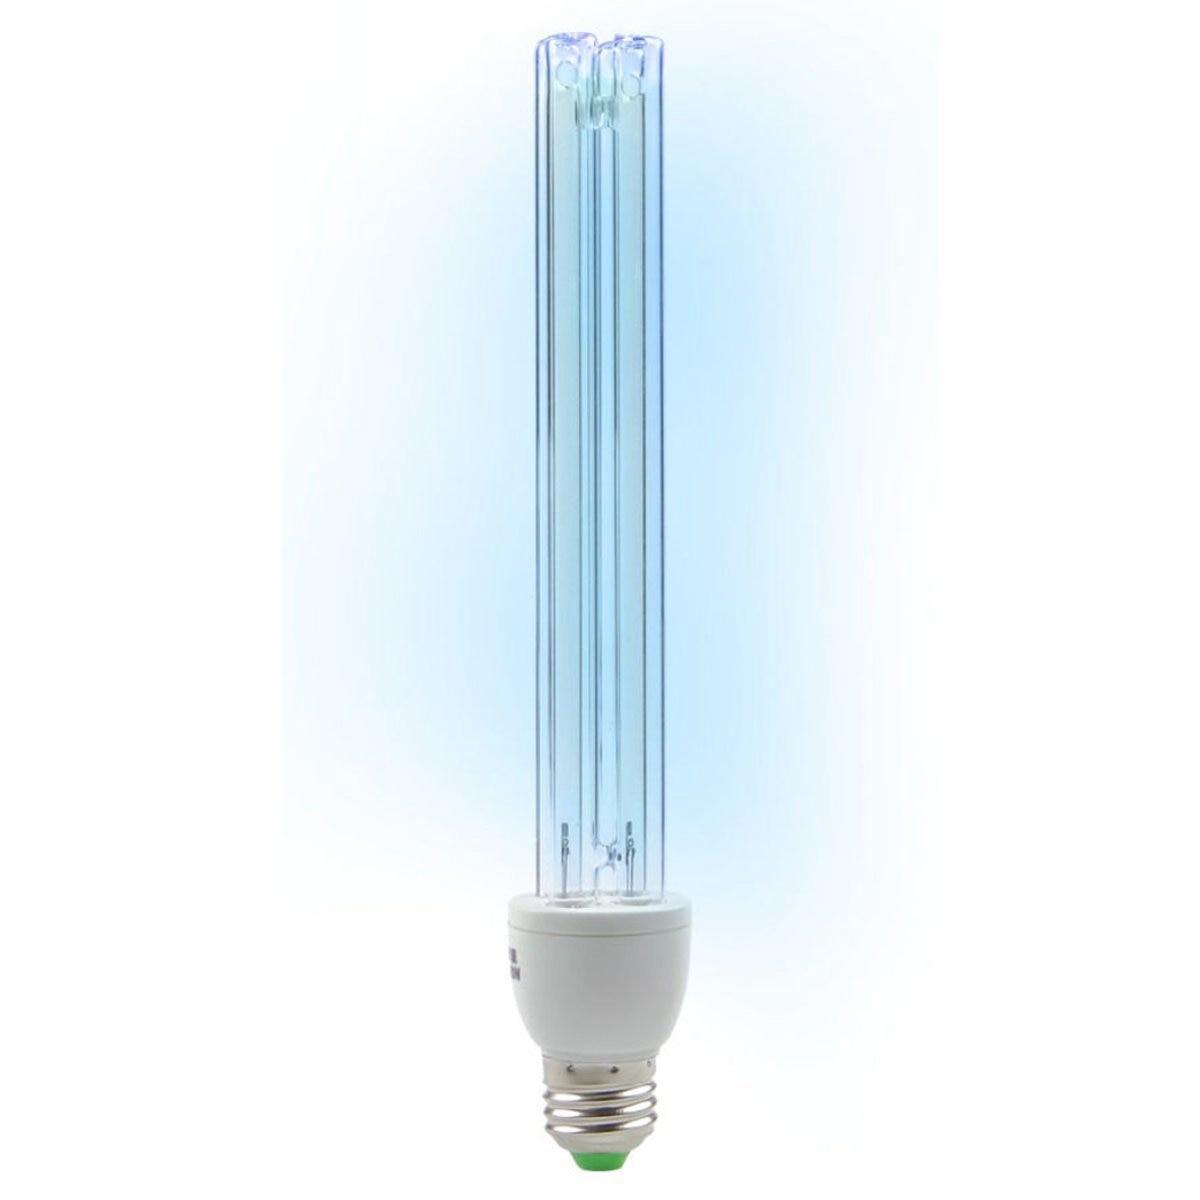 Uv Lampe Light Tube E27 20 Watt AC220V UVC Desinfektion Lampe Ozon Sterilisation Milben Lichter Keimtötende Lampe